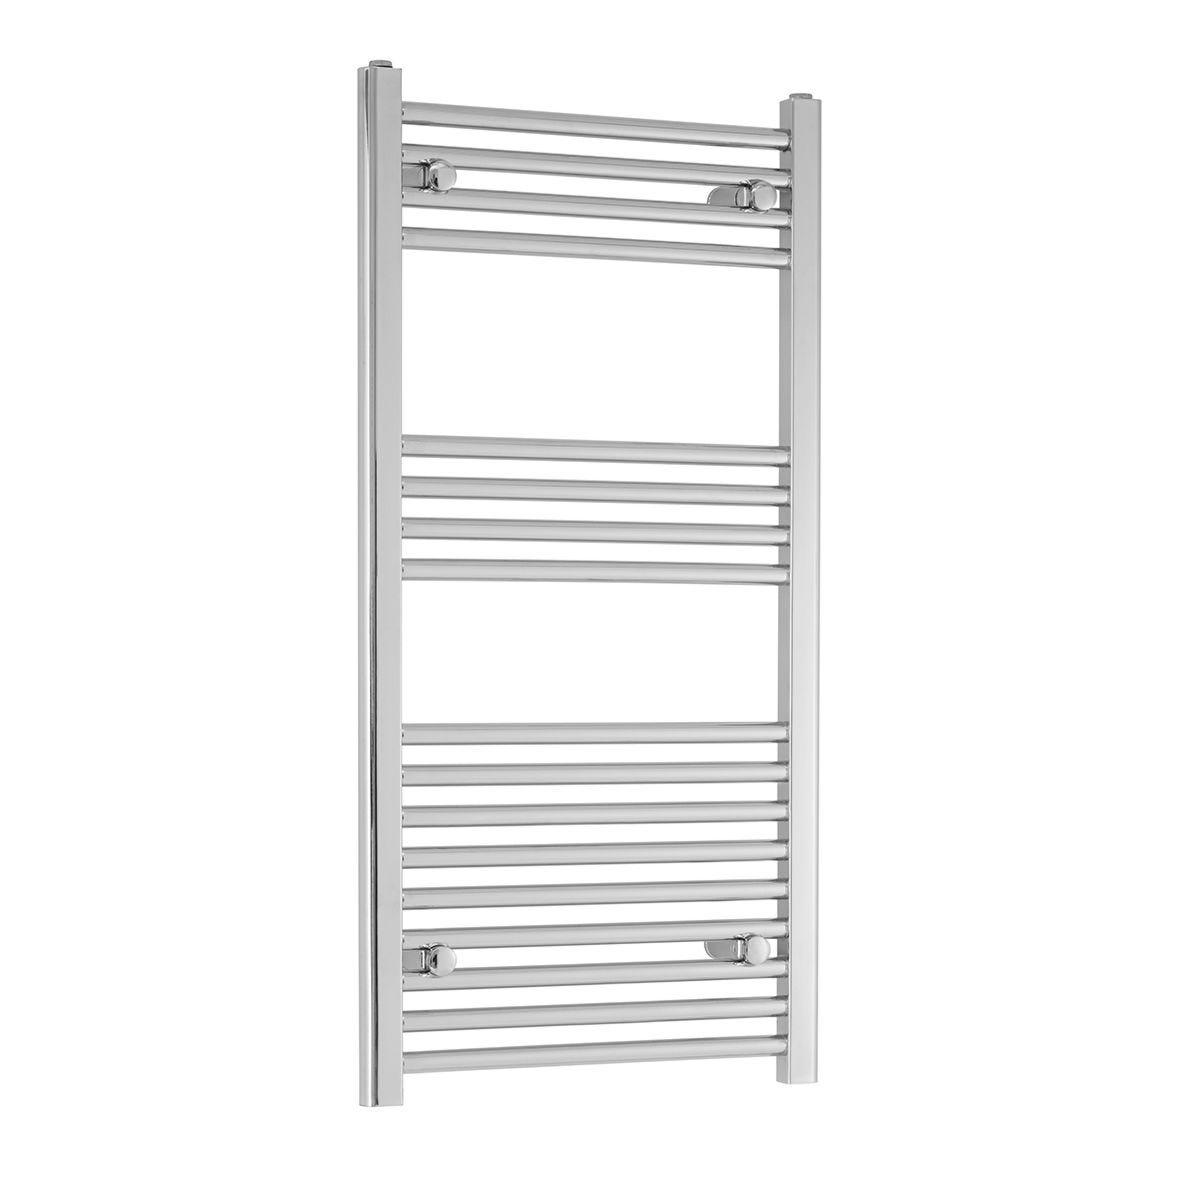 Heating Style Blythe Ladder Rail 1400x500mm Straight - Chrome